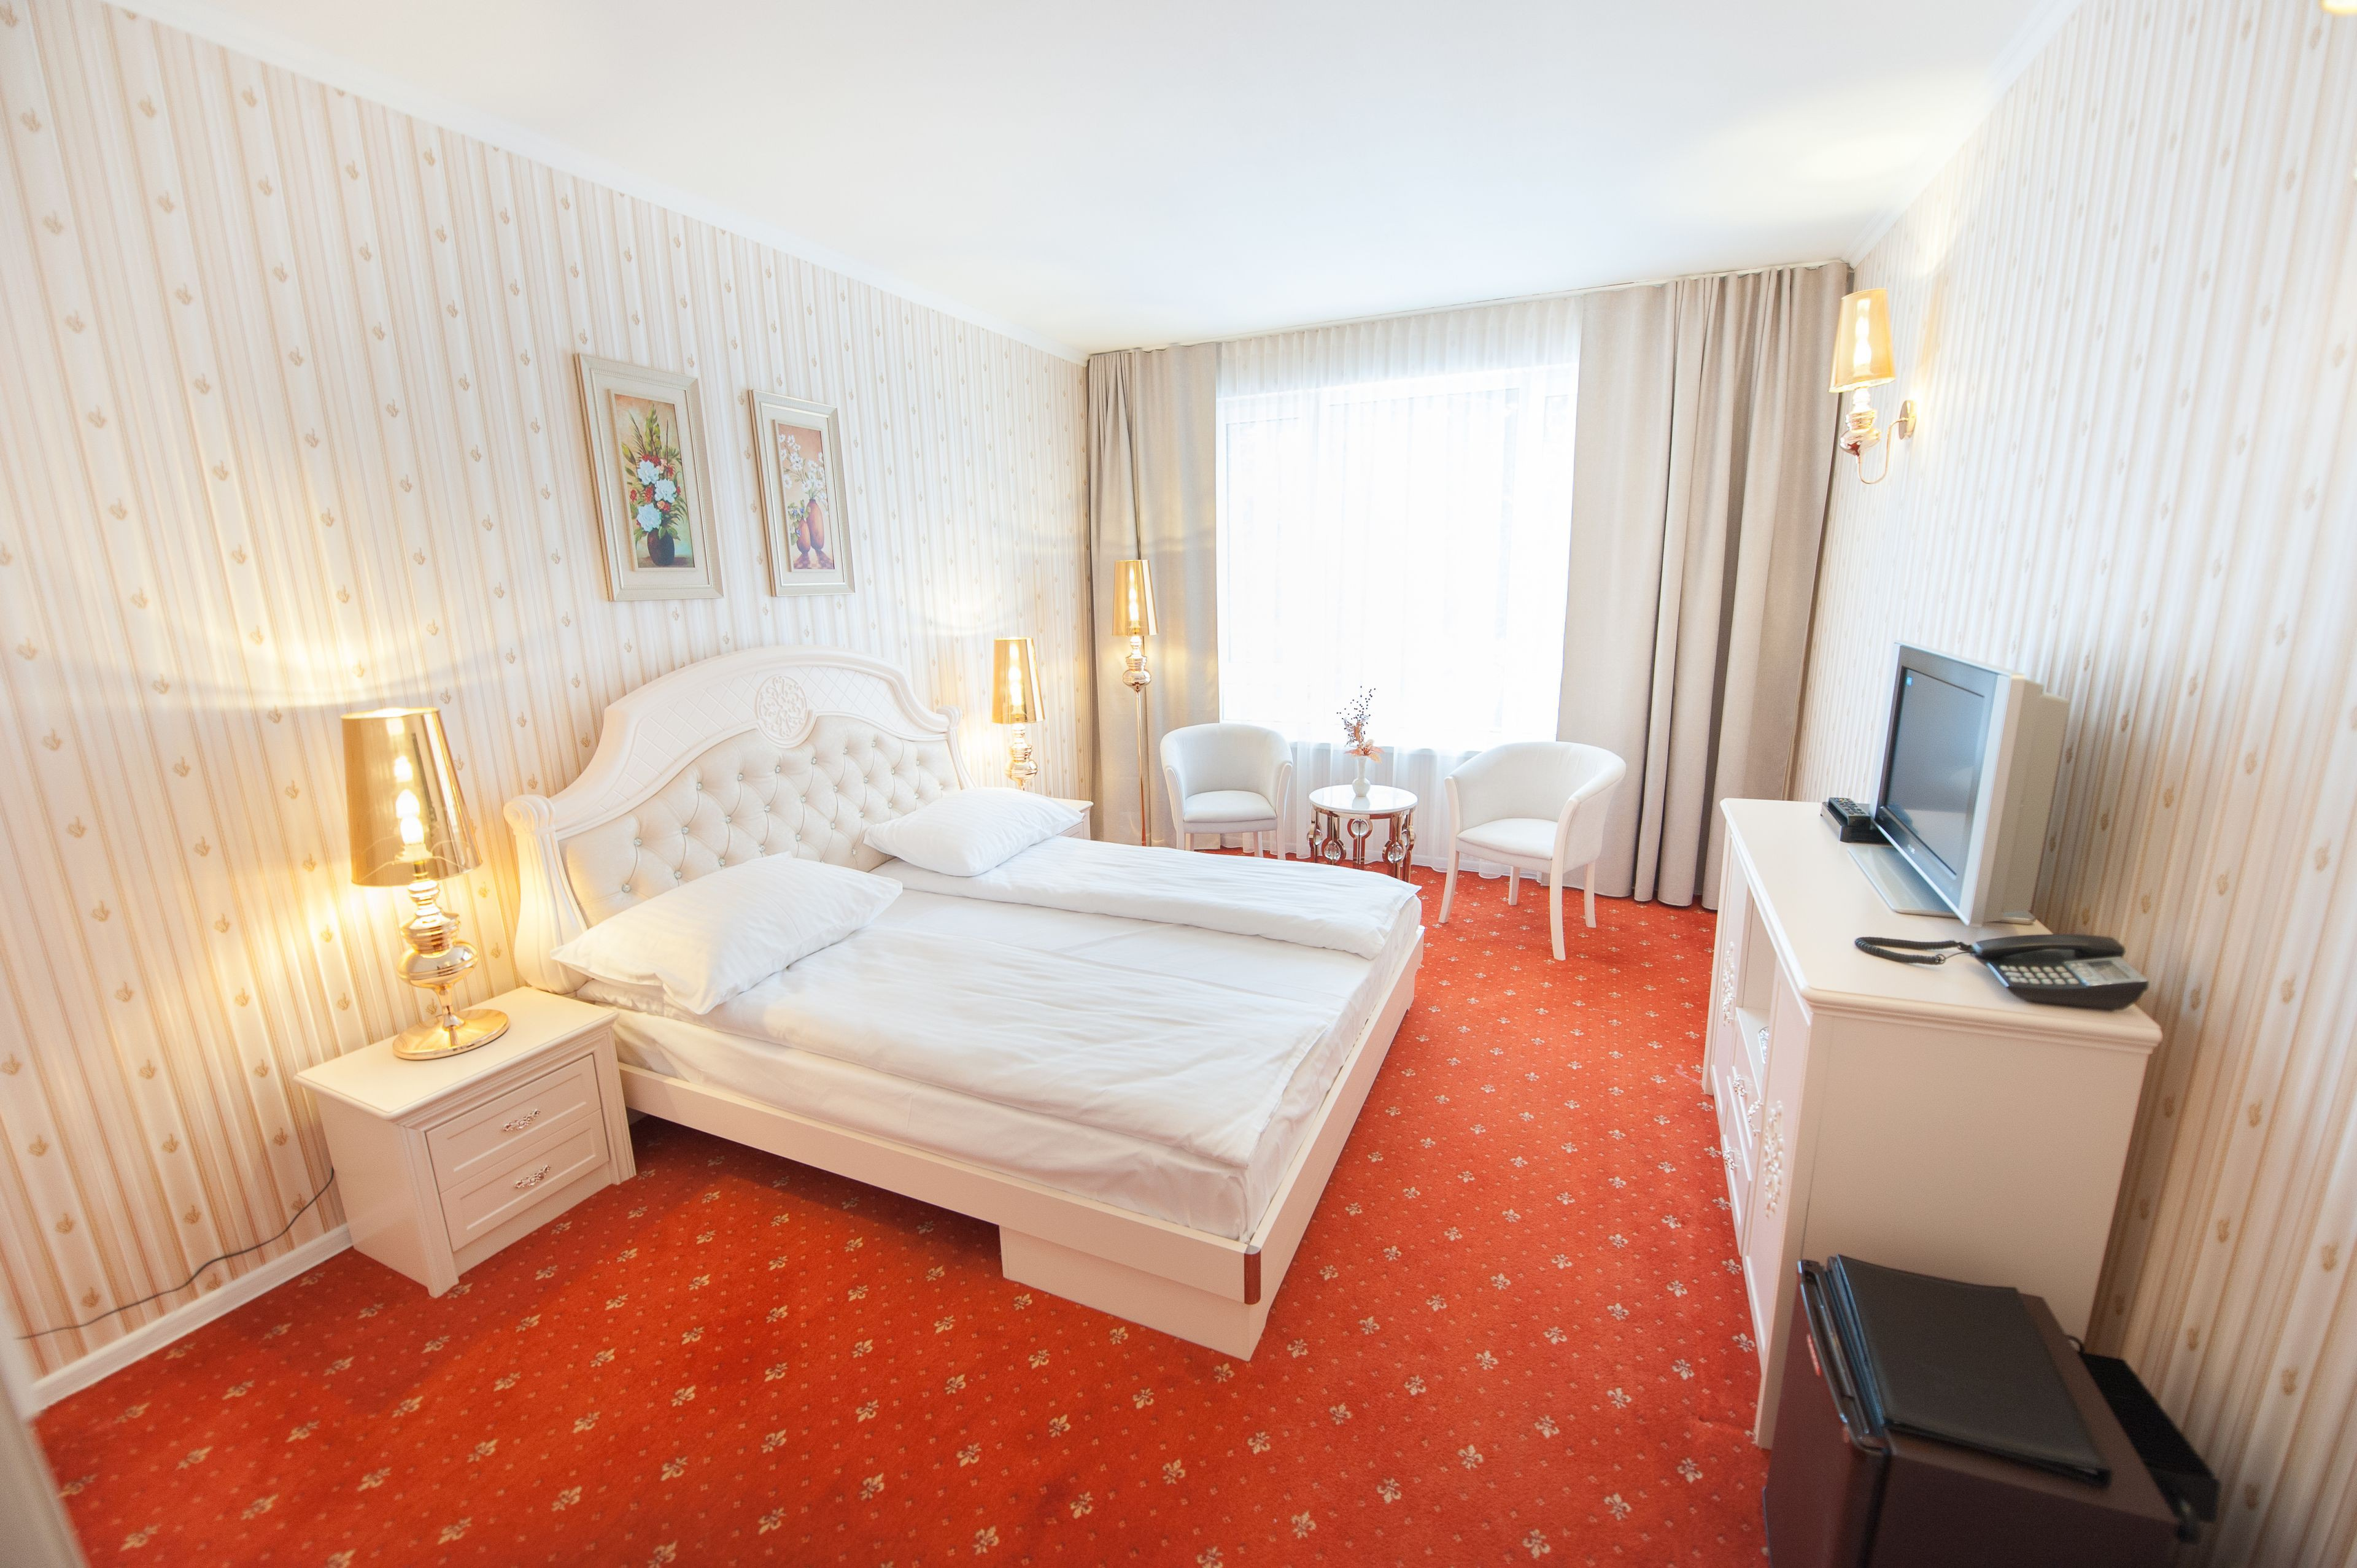 Courtesy of Hotel Carpathia / Expedia.com